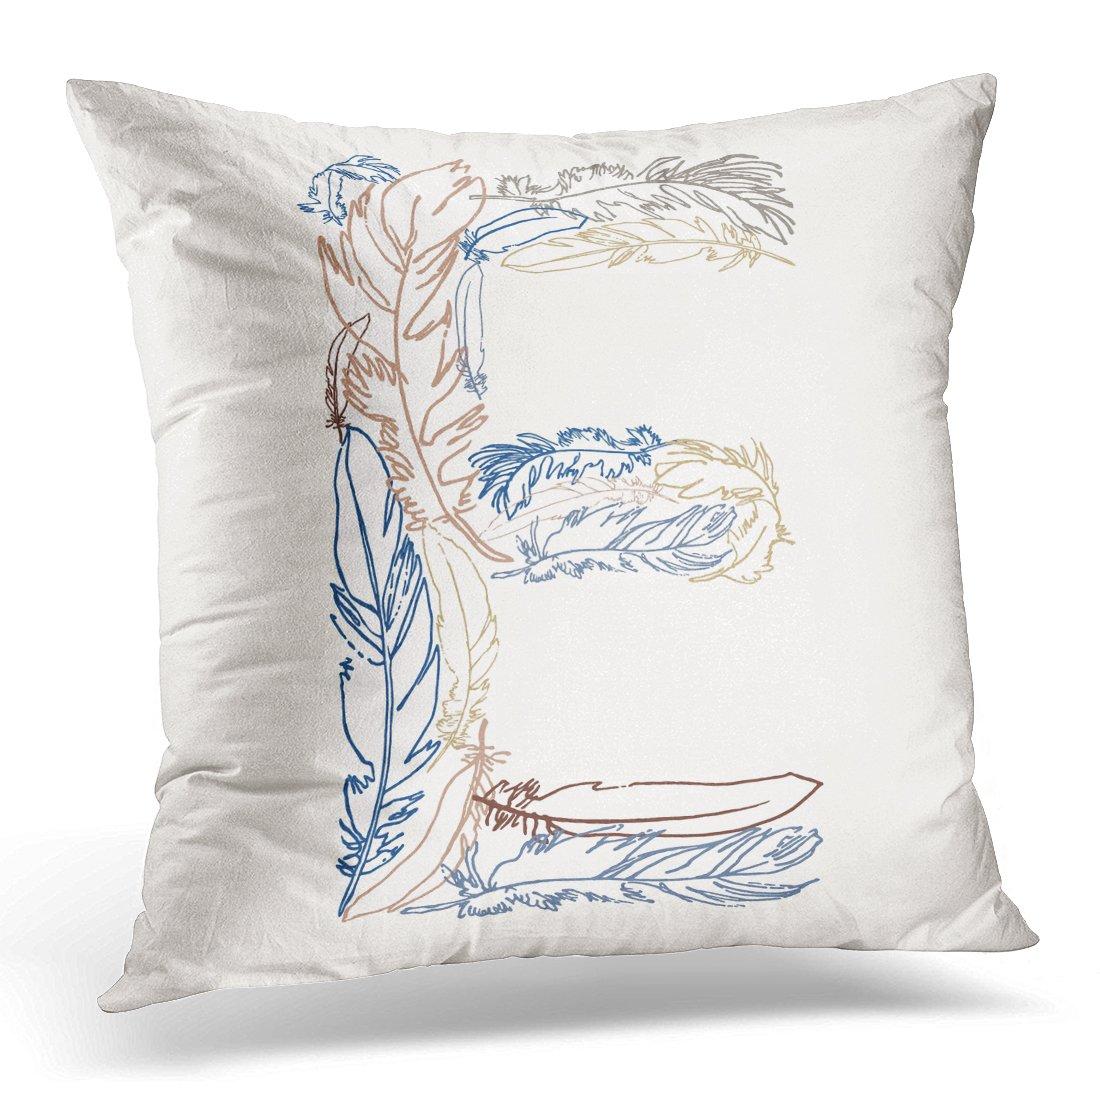 Amazon.com: Emvency Decorative Pillow Cover Wild Capital ...